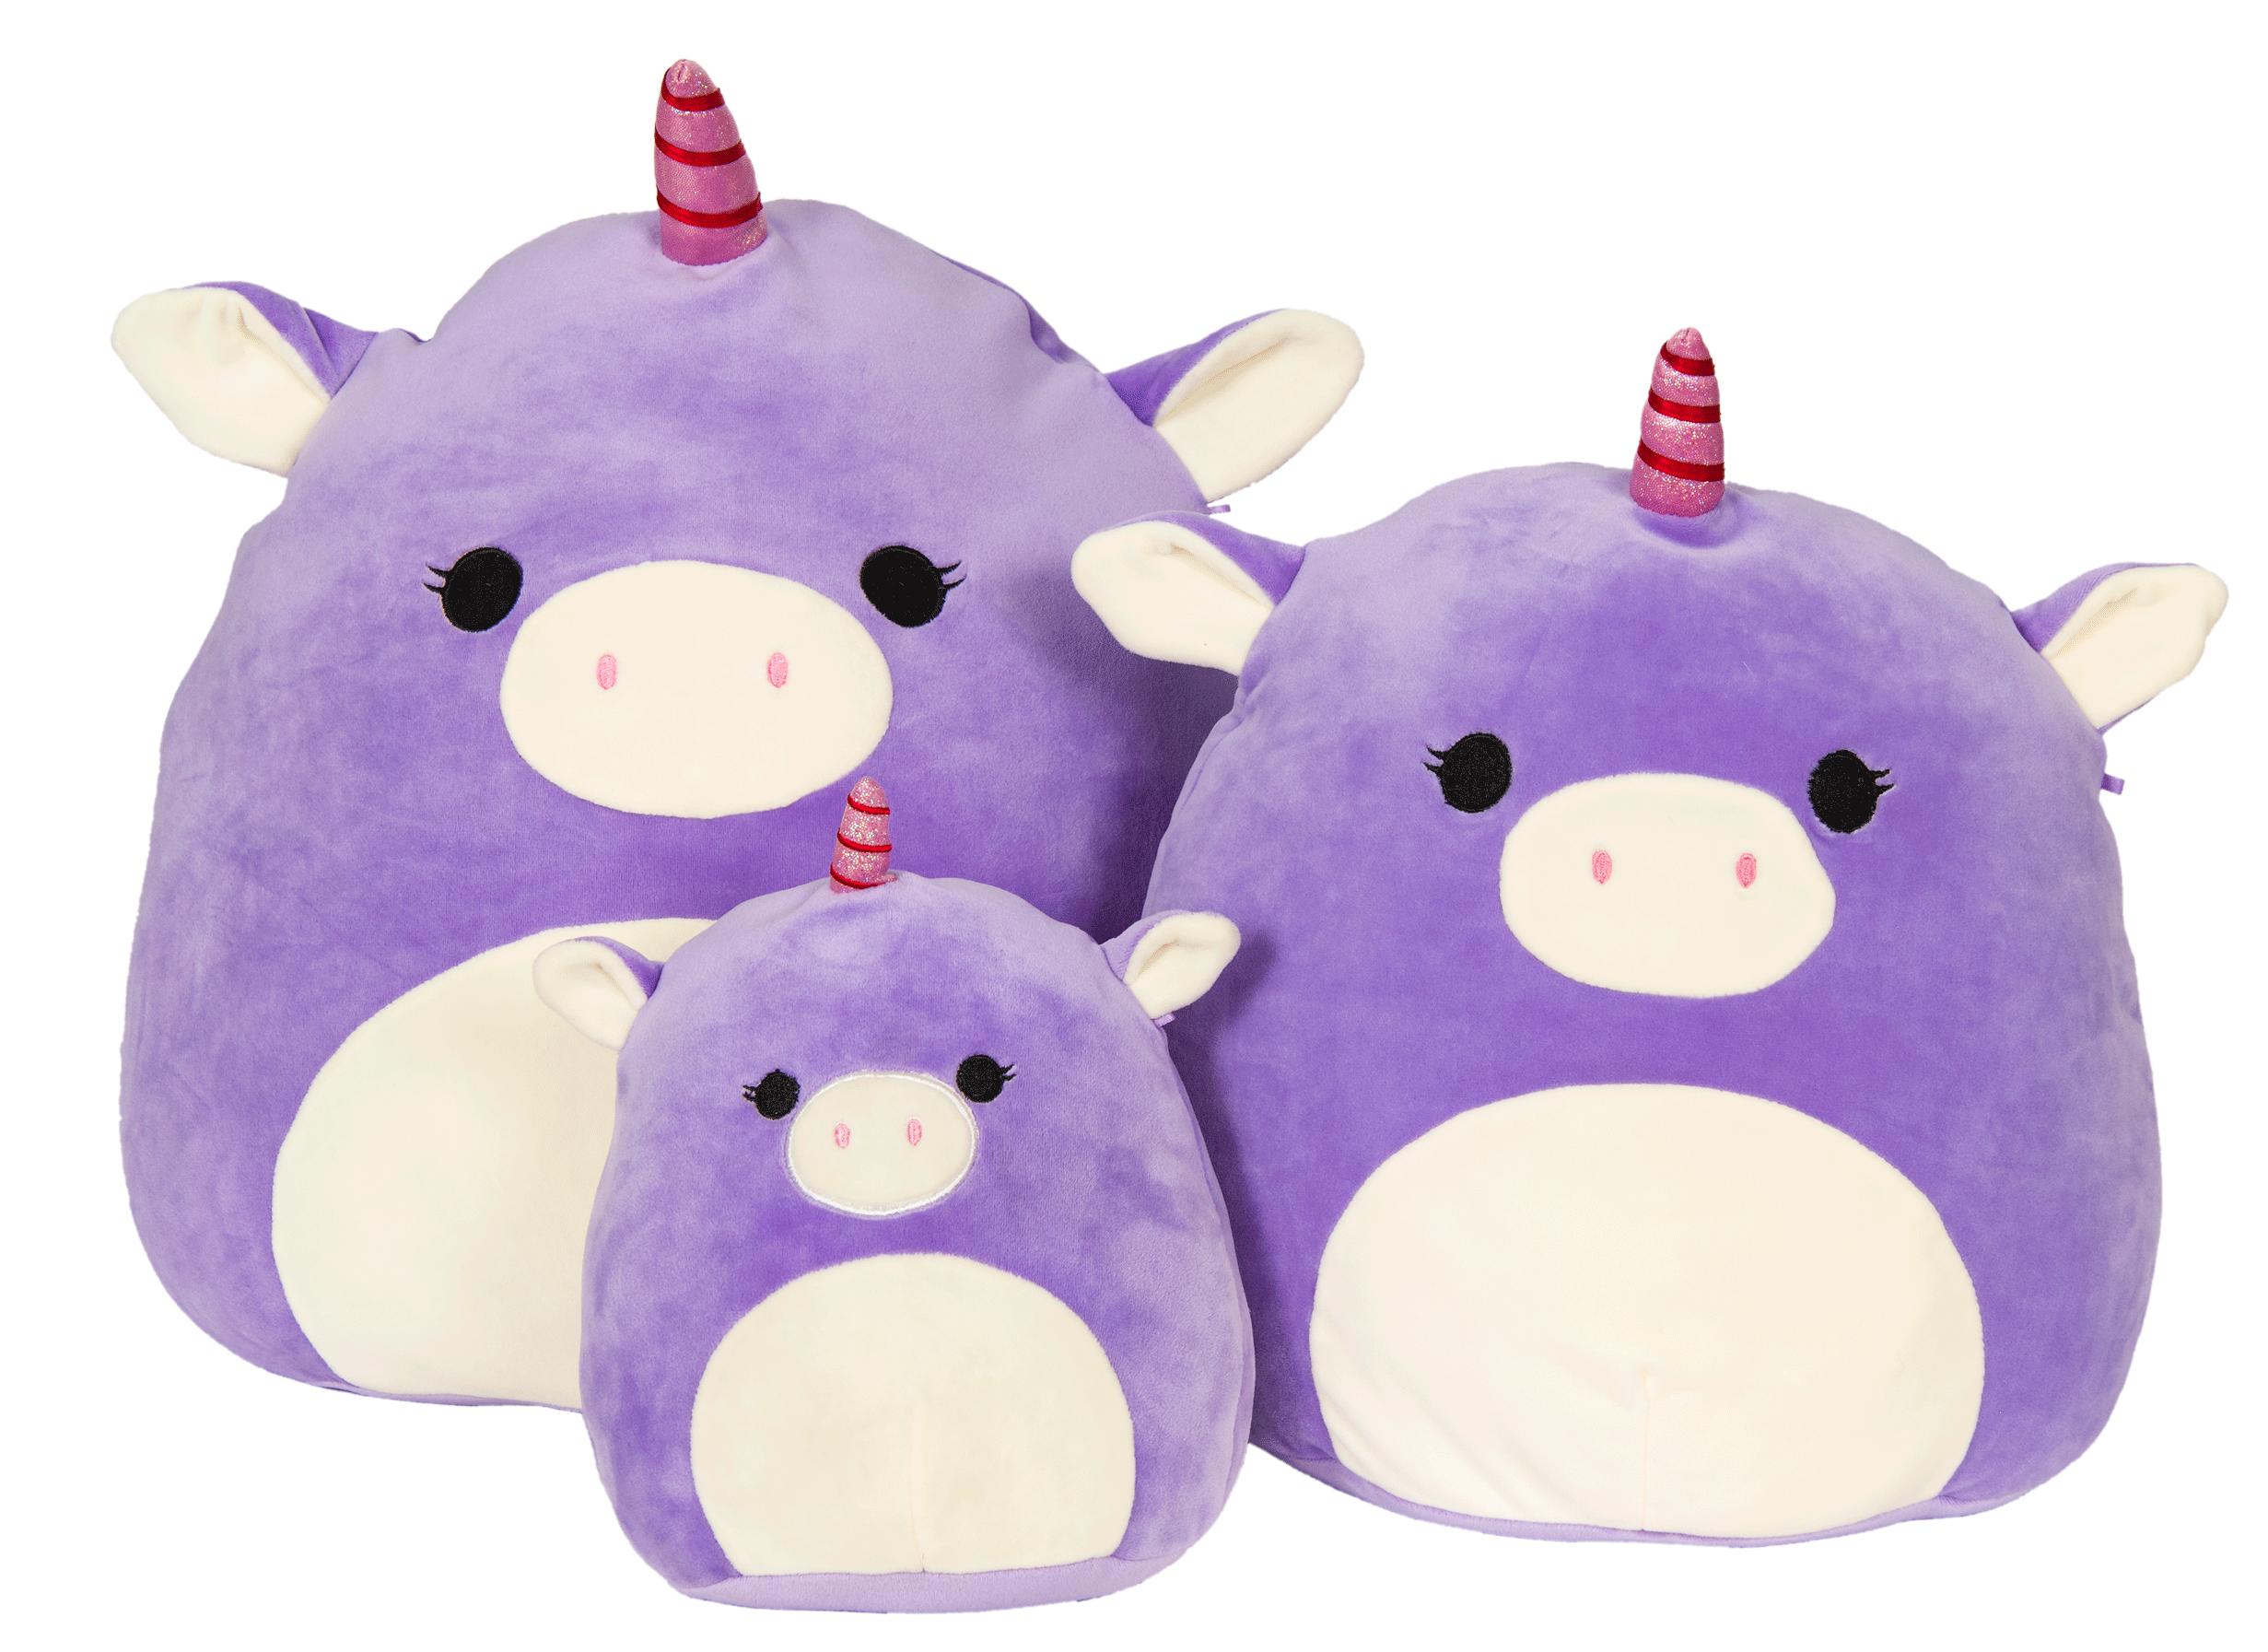 Astrid Squishmallows Cute Stuffed Animals Animal Plush Toys Handmade Soft Toys